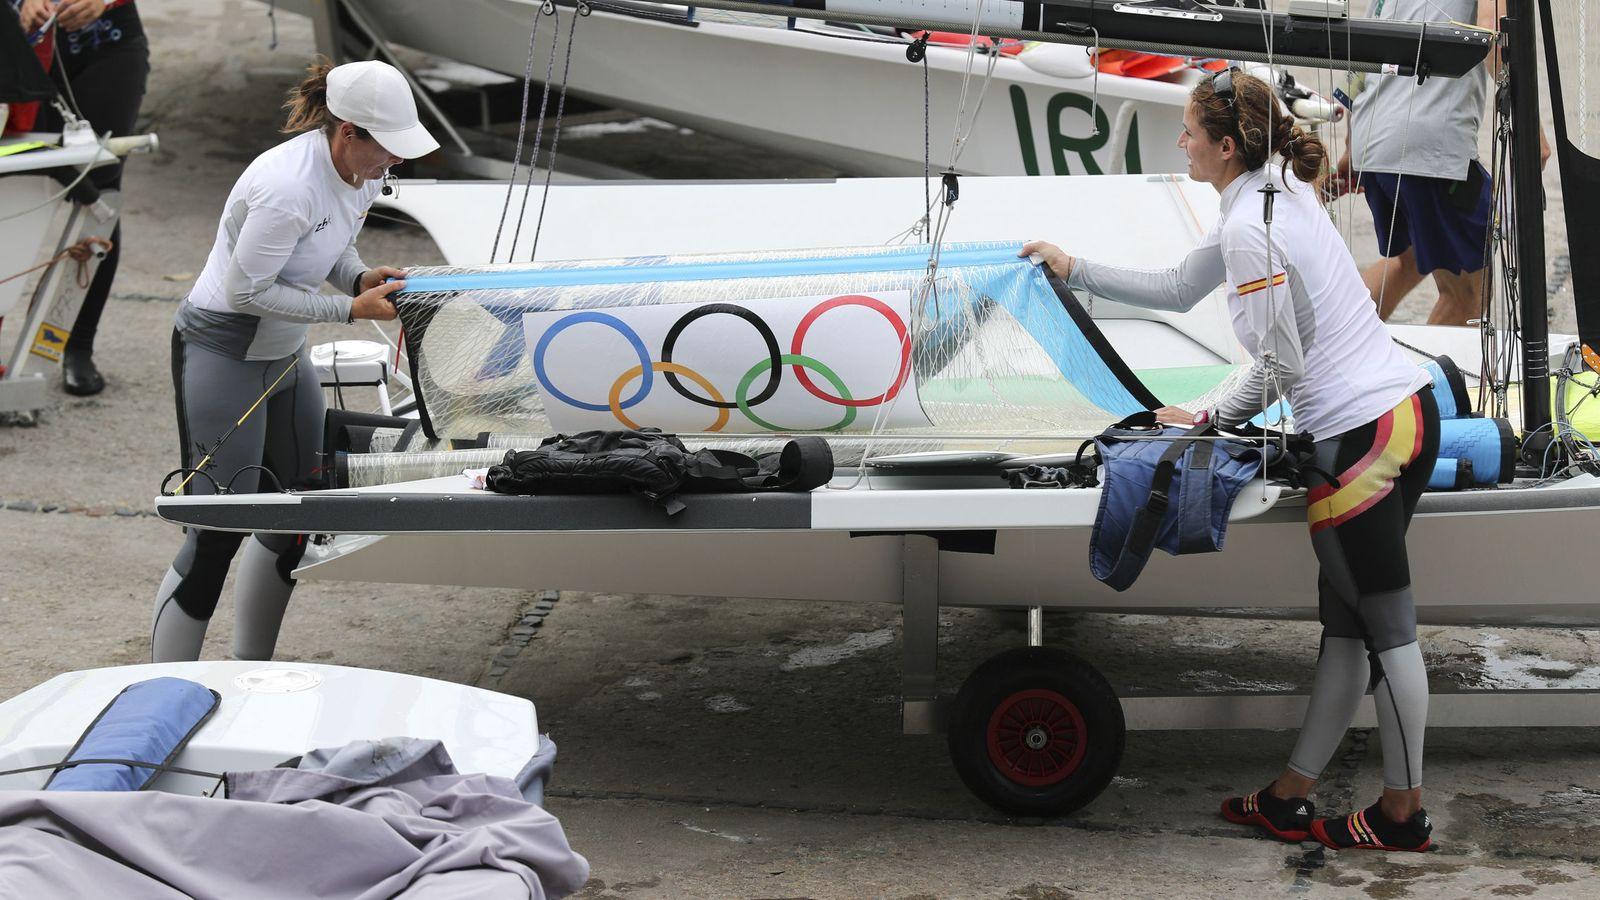 Foto: Berta Betanzos y Támara Echegoyen preparan el barco (EFE)